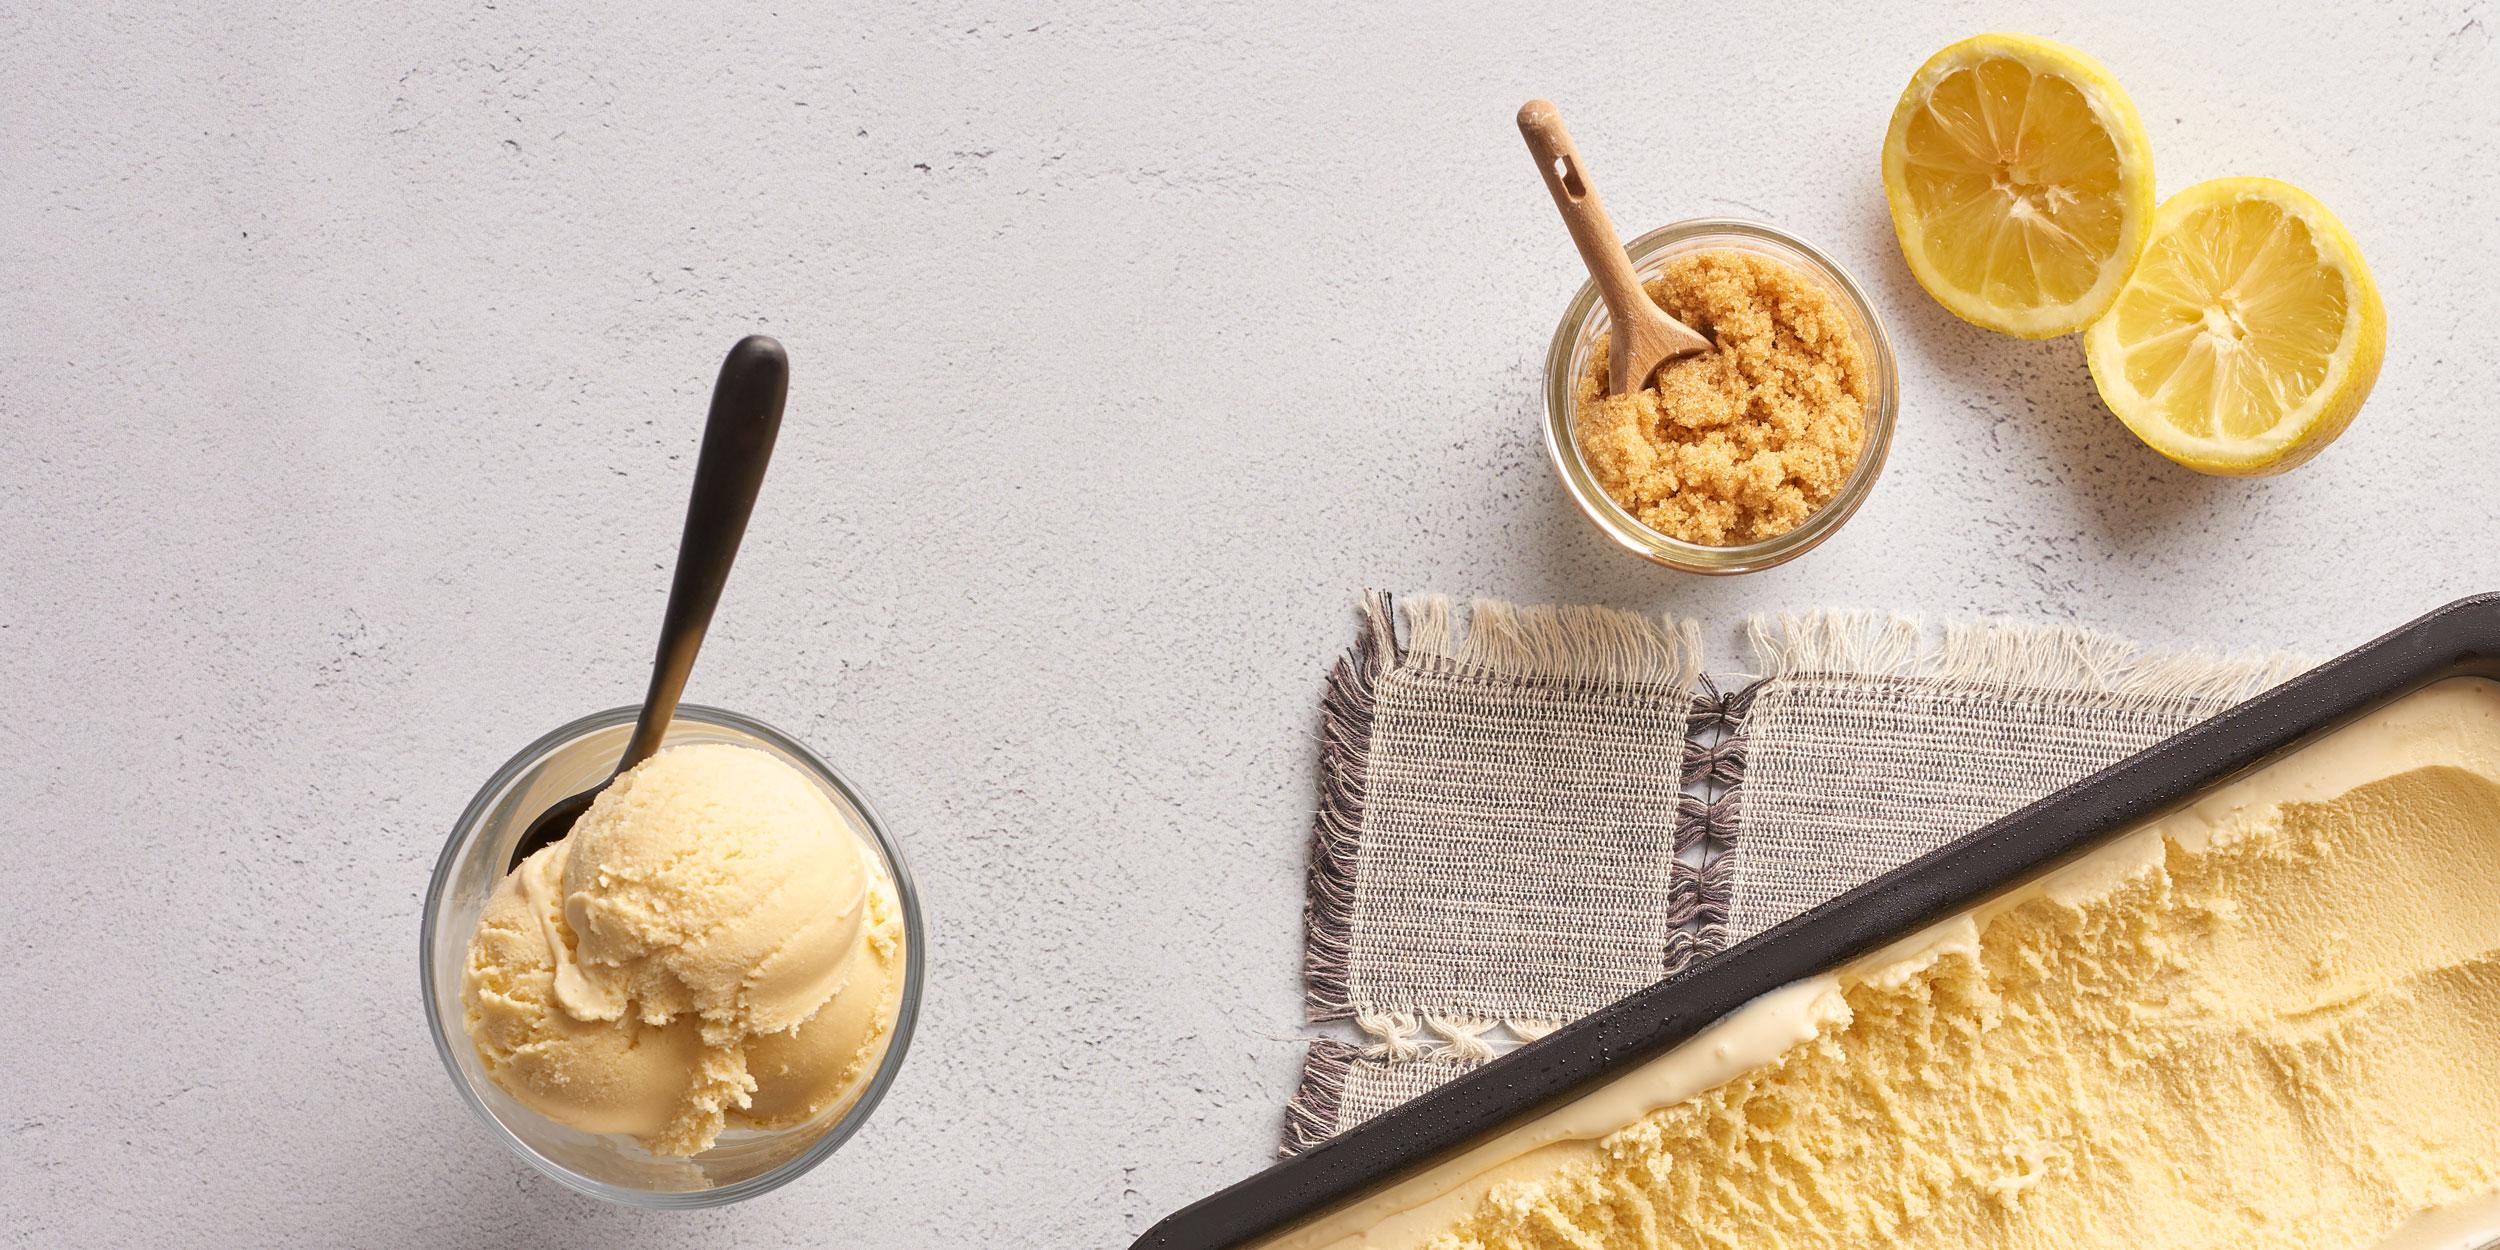 190524---Ice-cream-0040.jpg